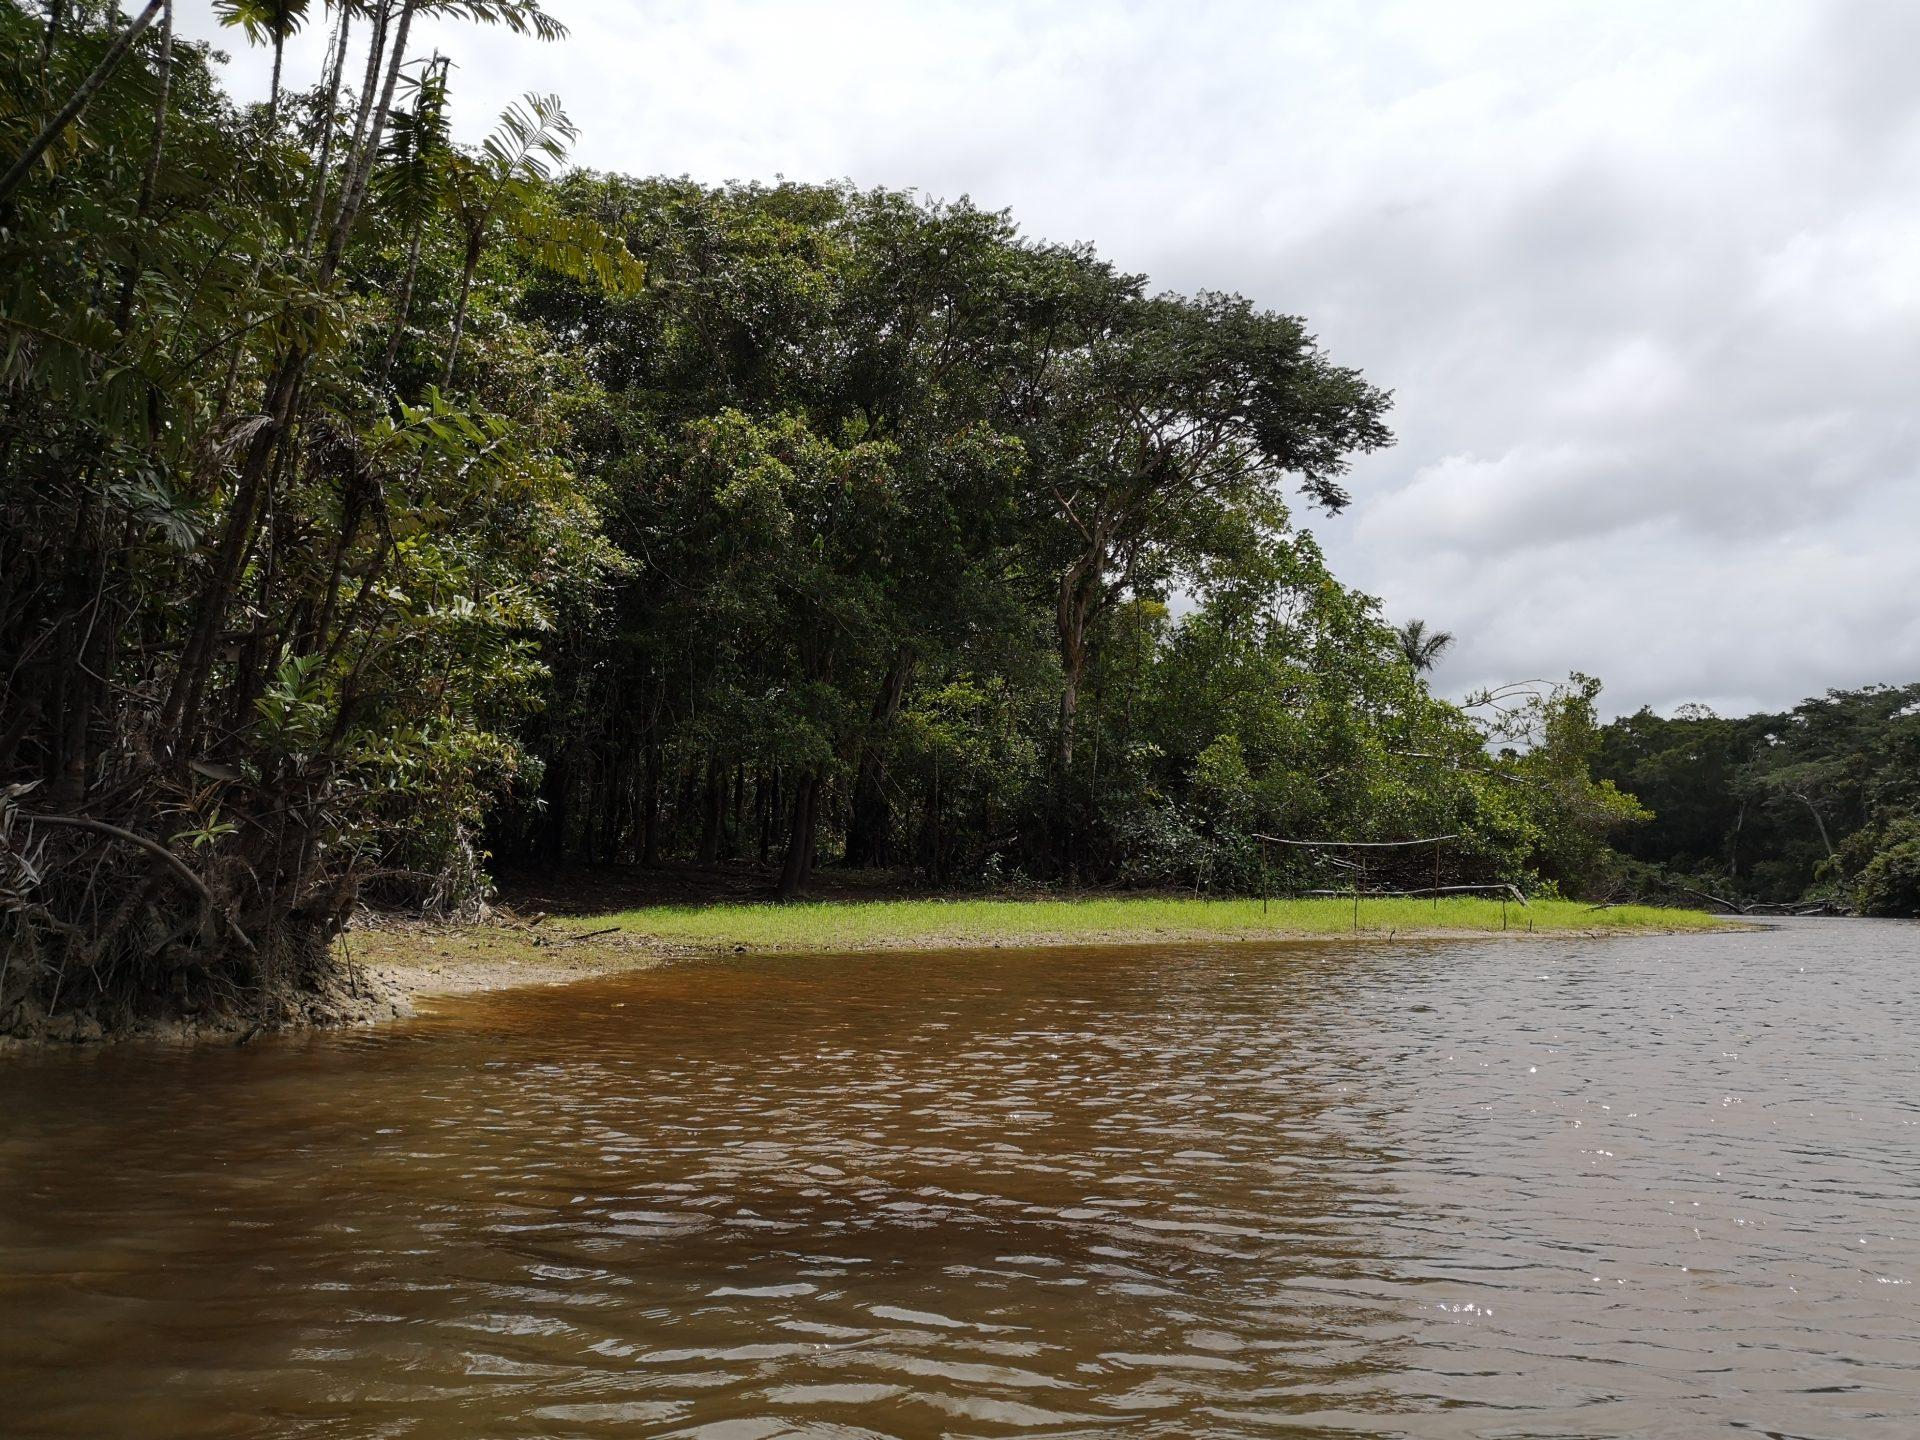 Razglednice iz Latinske Amerike – Džungla I deo